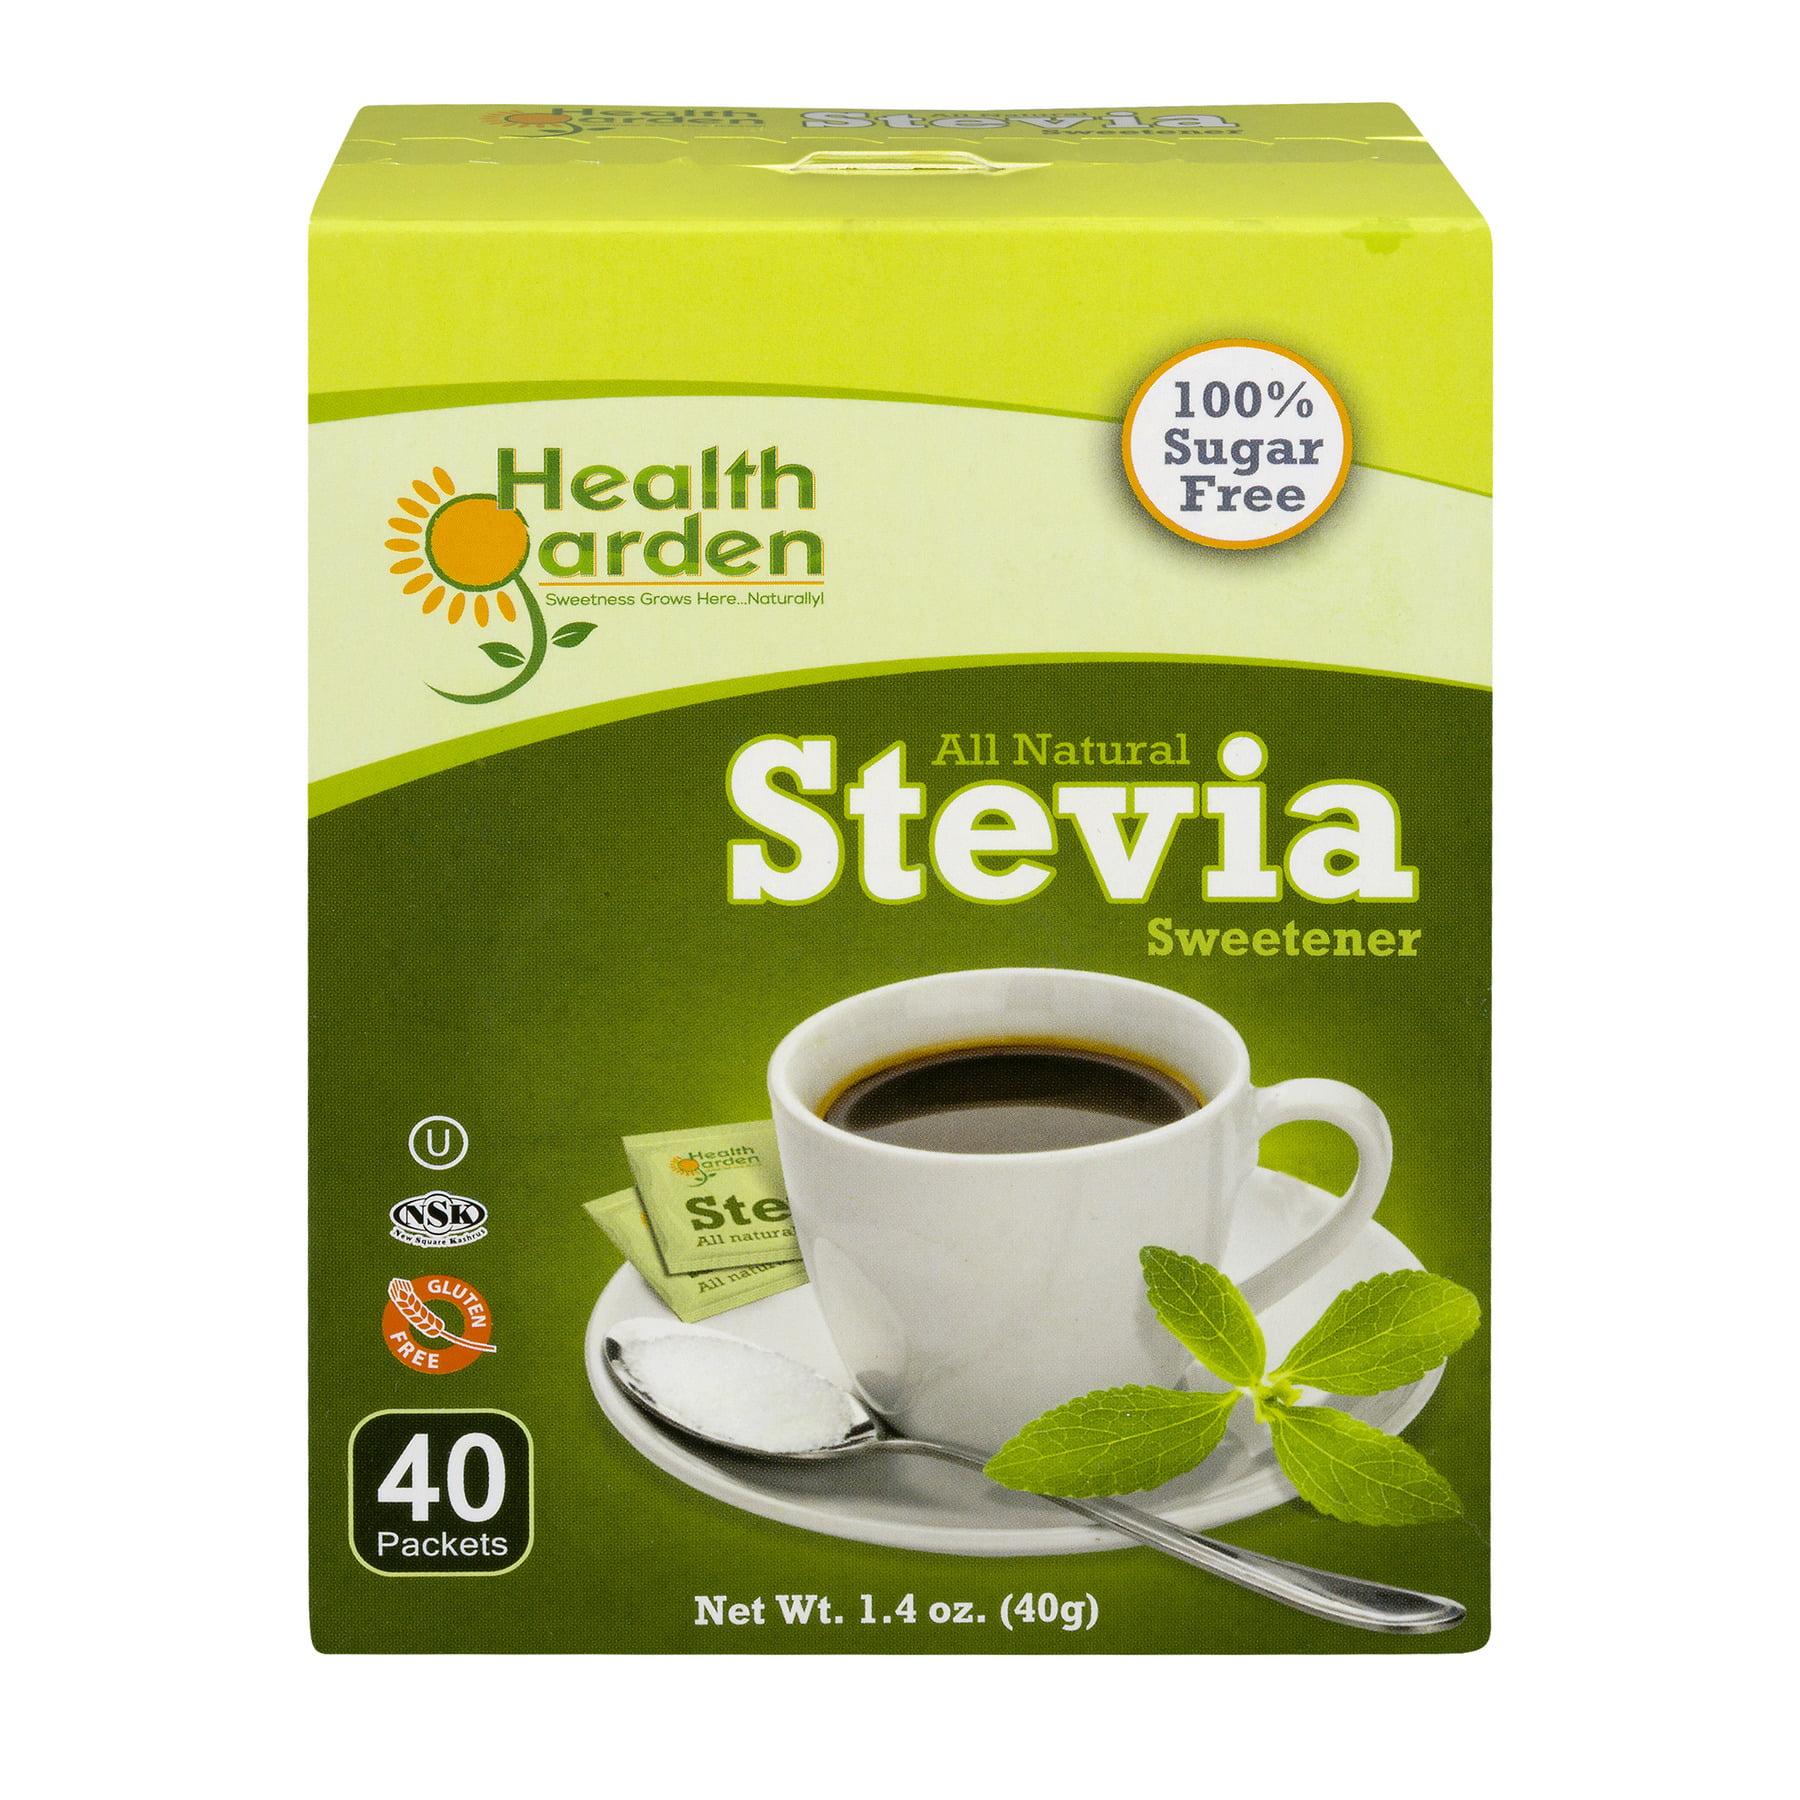 Health Garden All Natural Stevia Sweetener, 40 CT